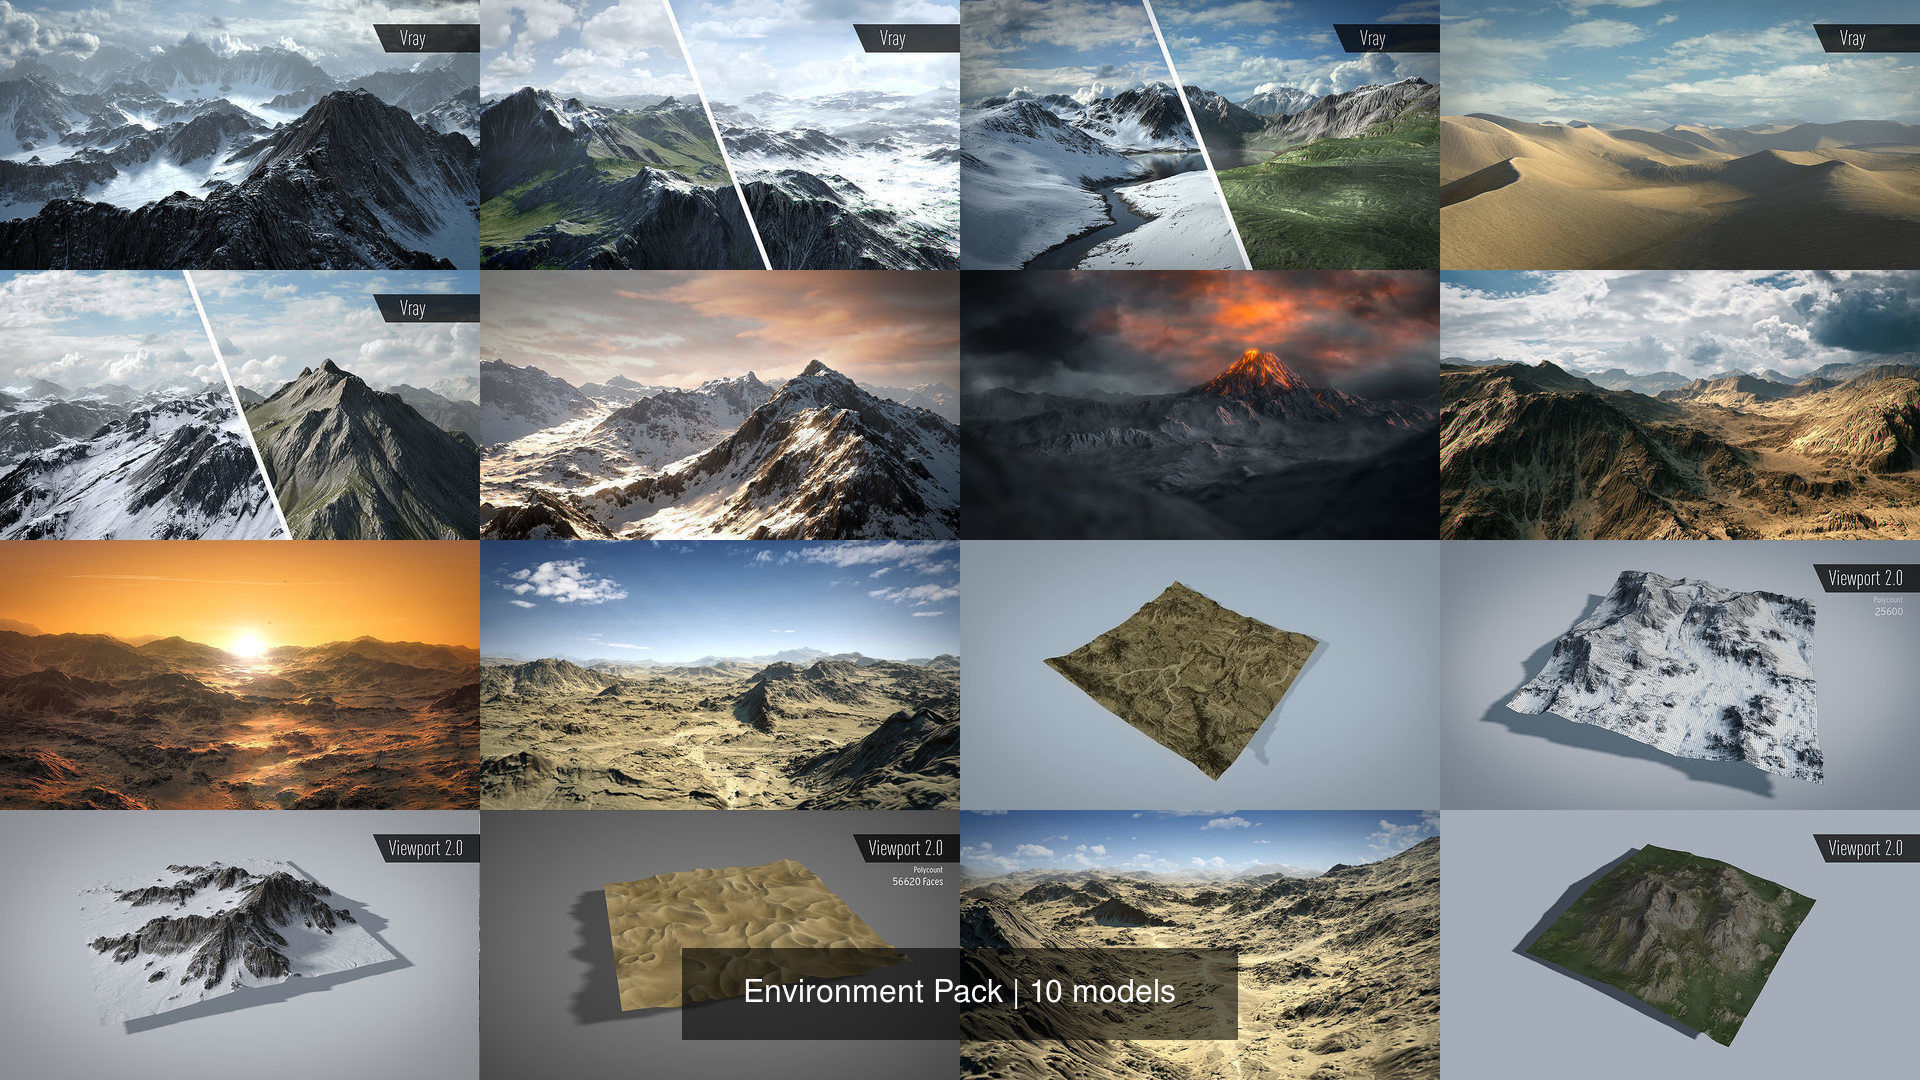 Environment Pack